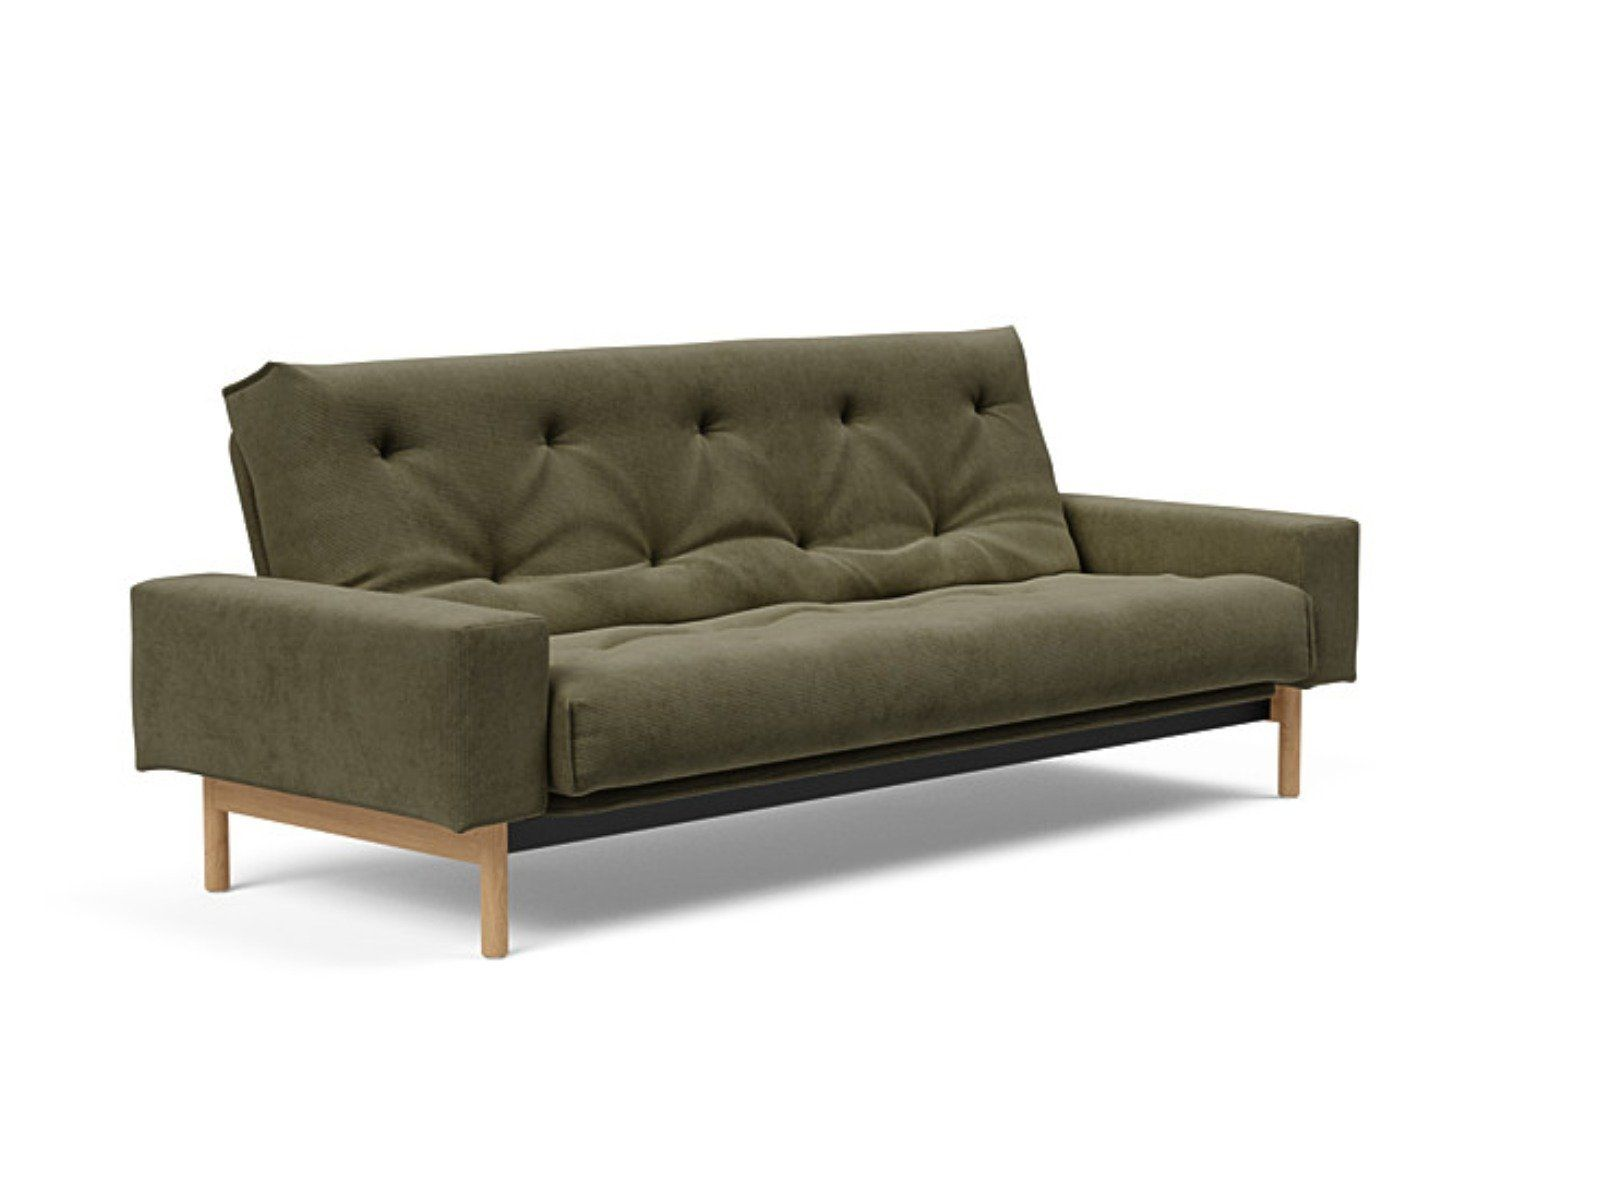 Innovation Living Mimer Sofa Bed In 2021 Elegant Sofa Bed Sofa Bed Design Sofa